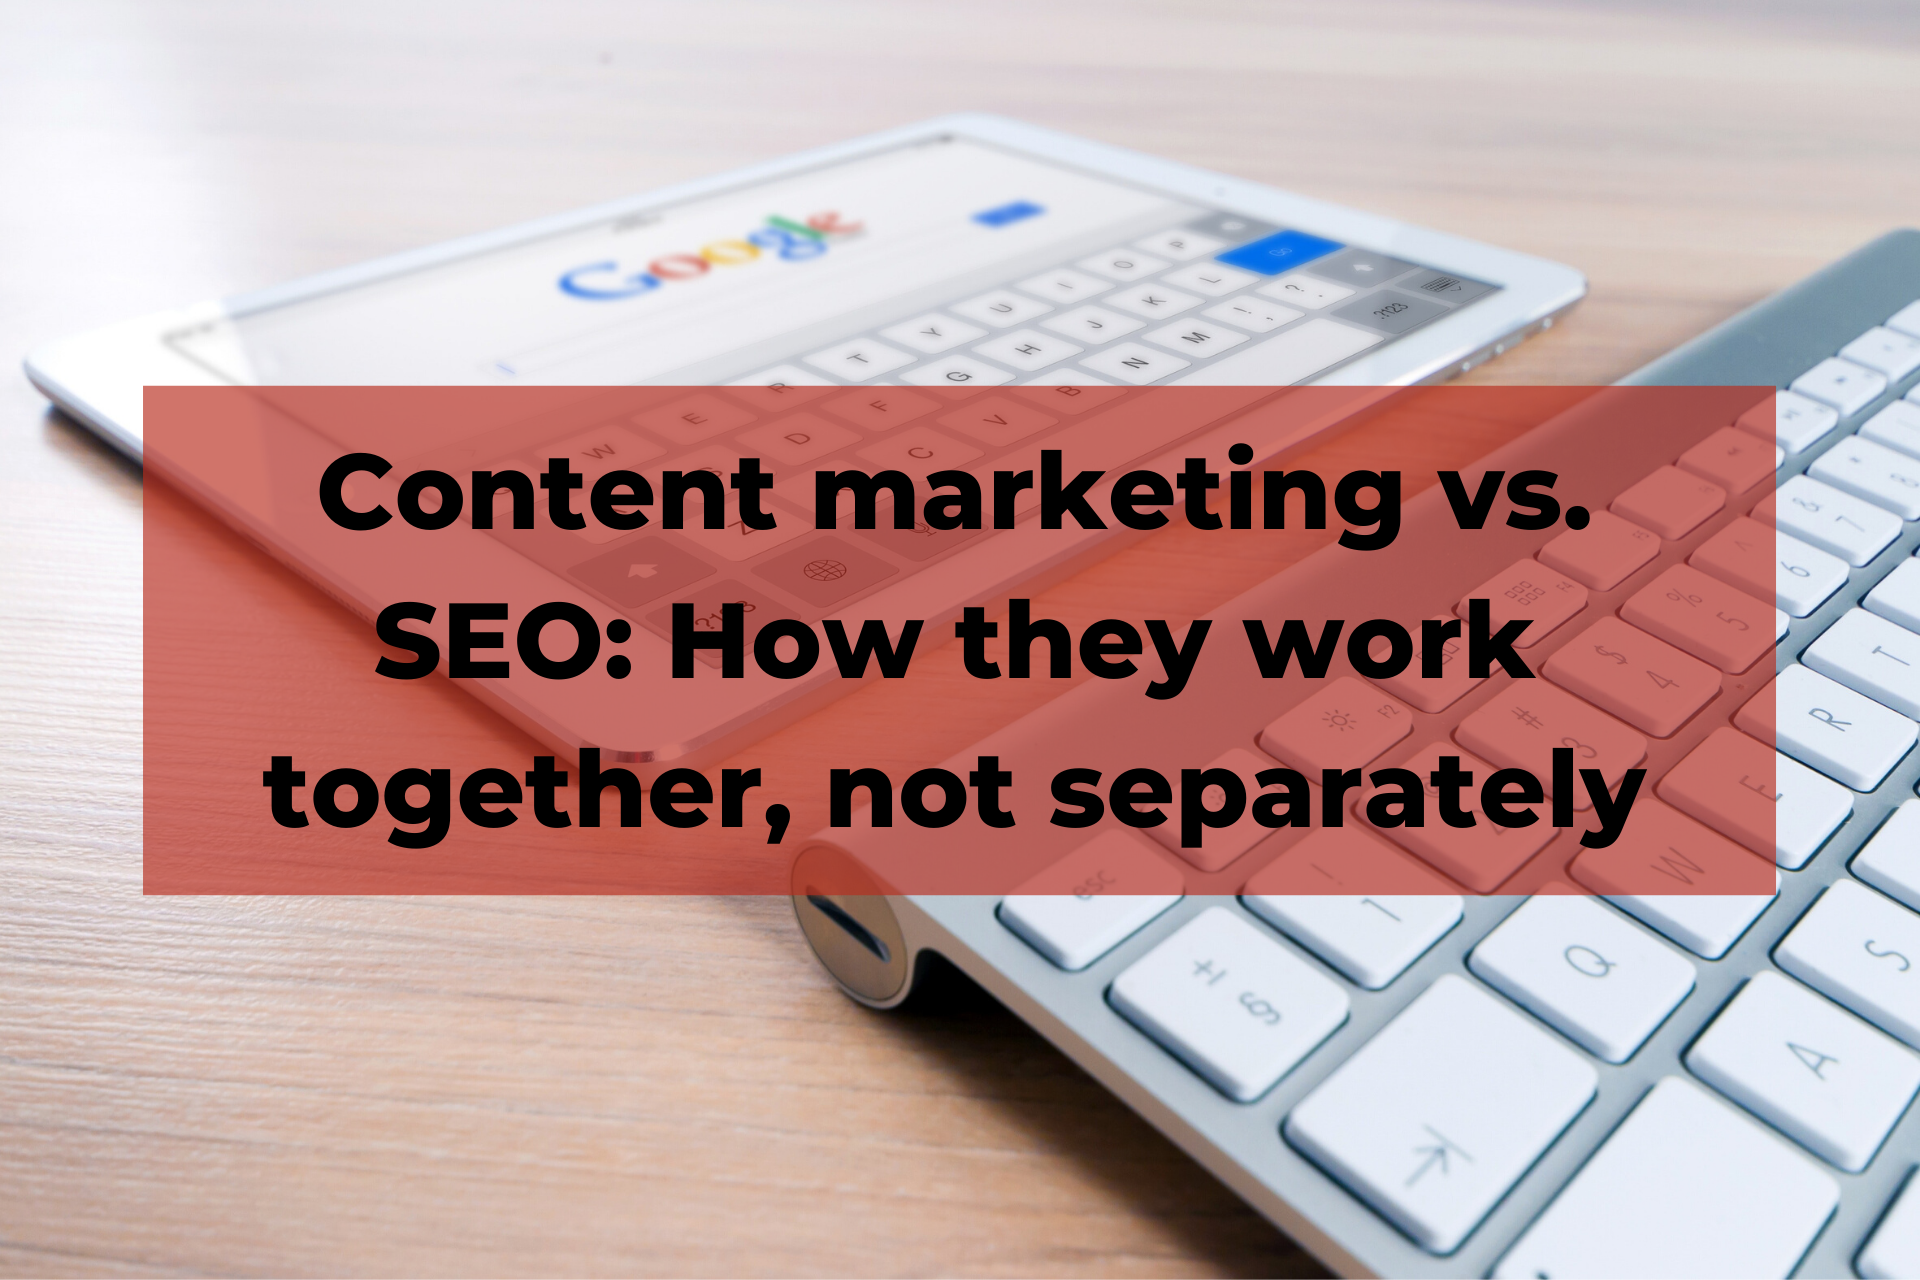 Content marketing vs. SEO